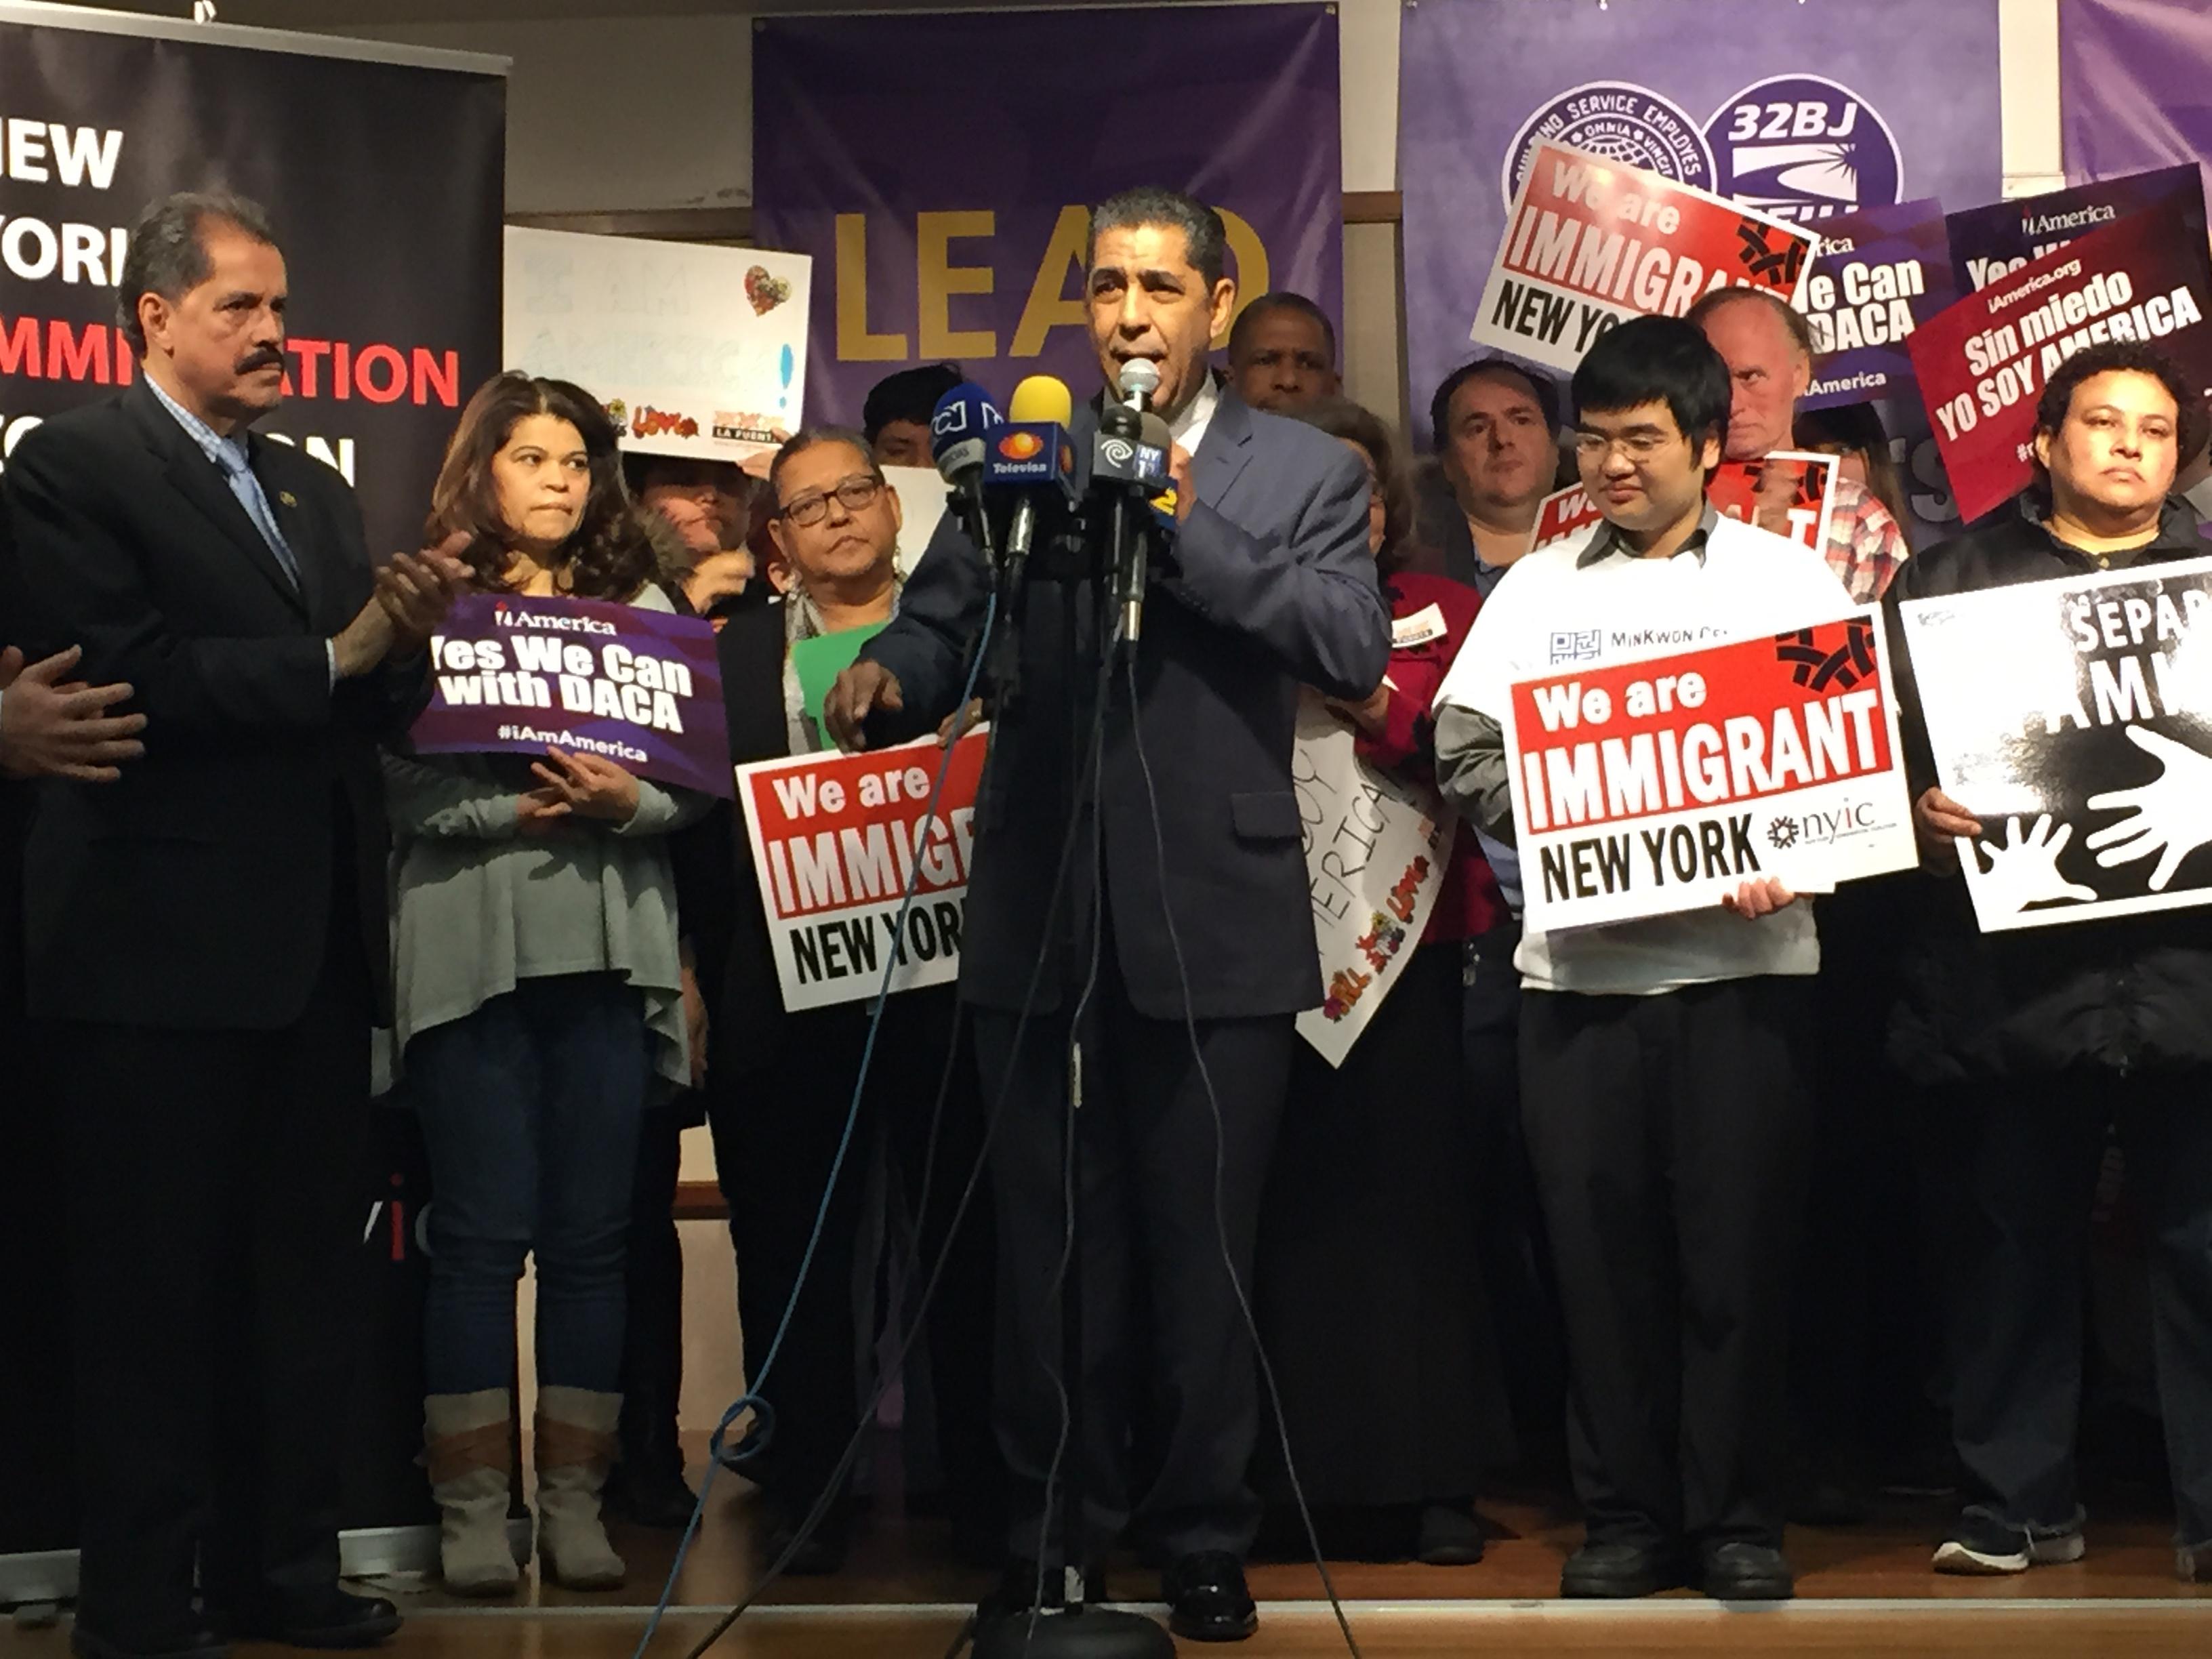 State Senator Adriano Espaillat speaks during a New York Immigration Coalition press conference. (Photo: Jillian Jorgensen/New York Observer)